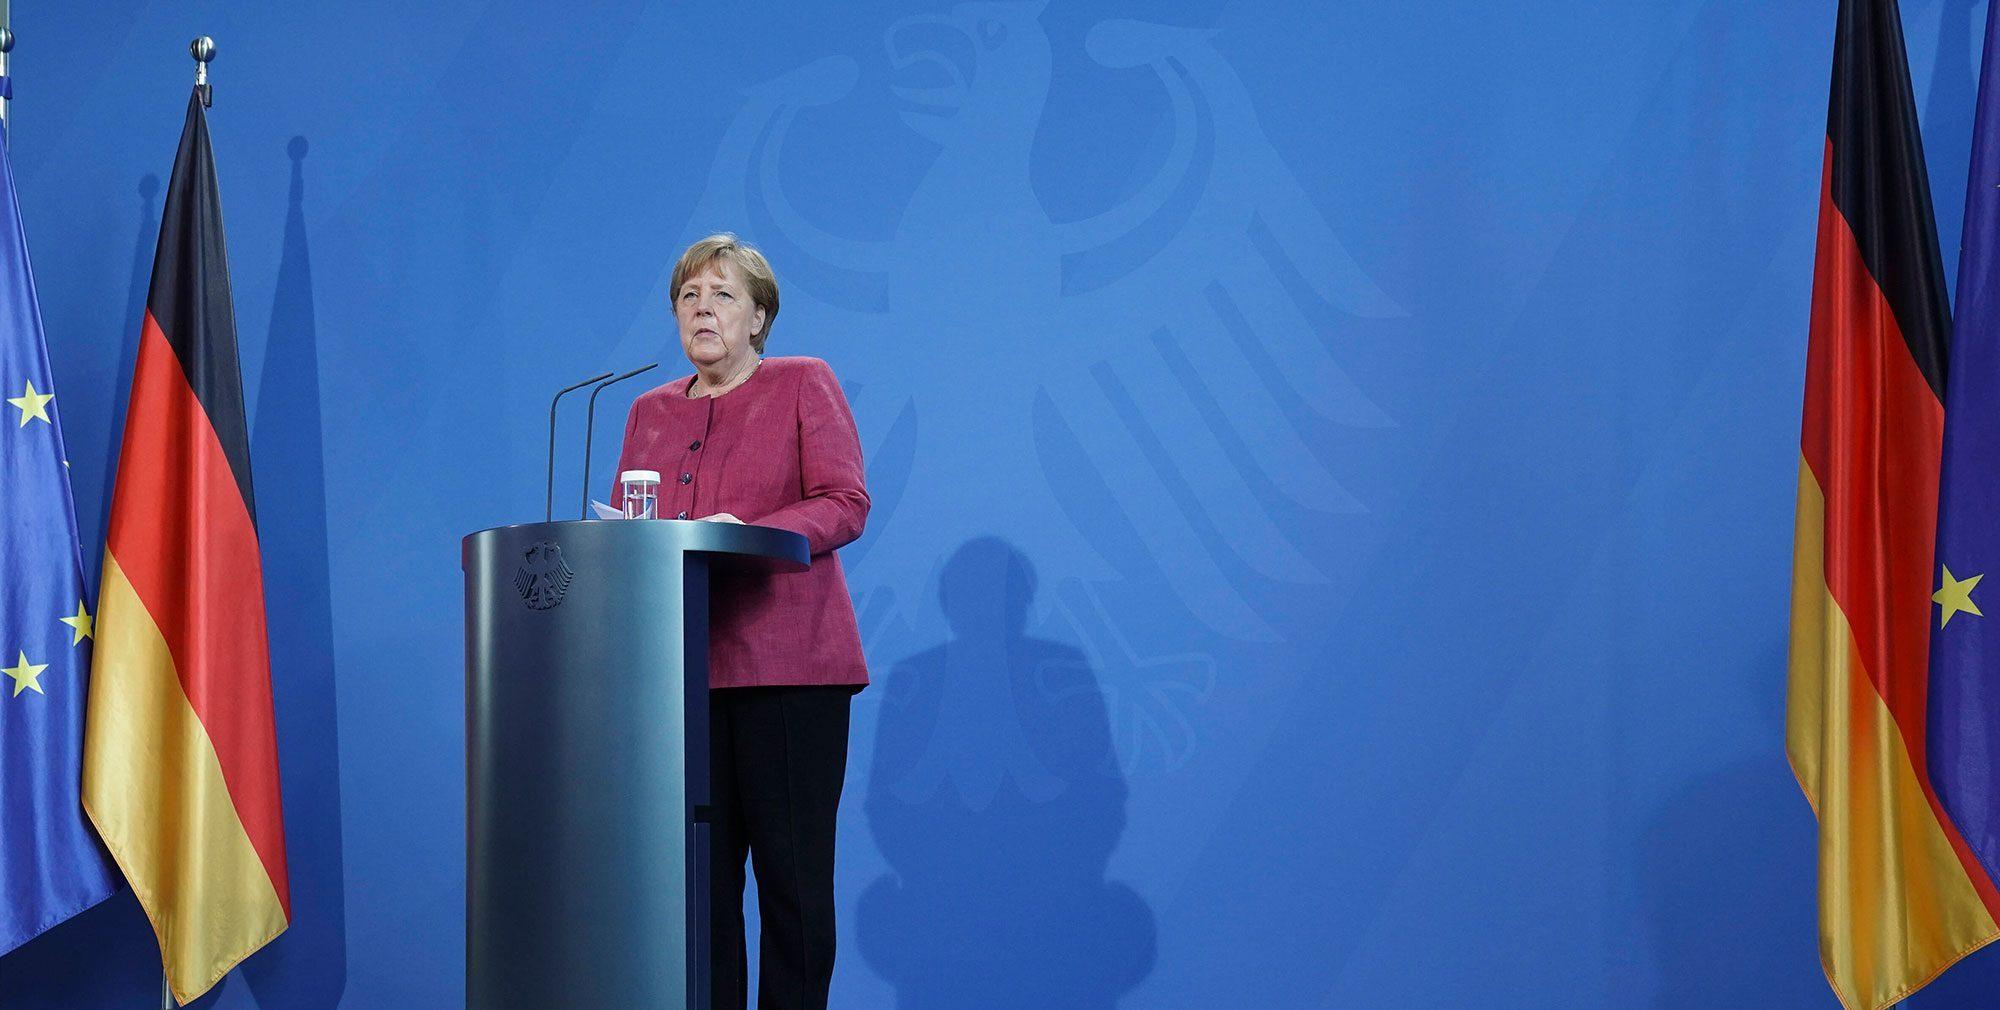 Merci and Adieu, Mutti Merkel!